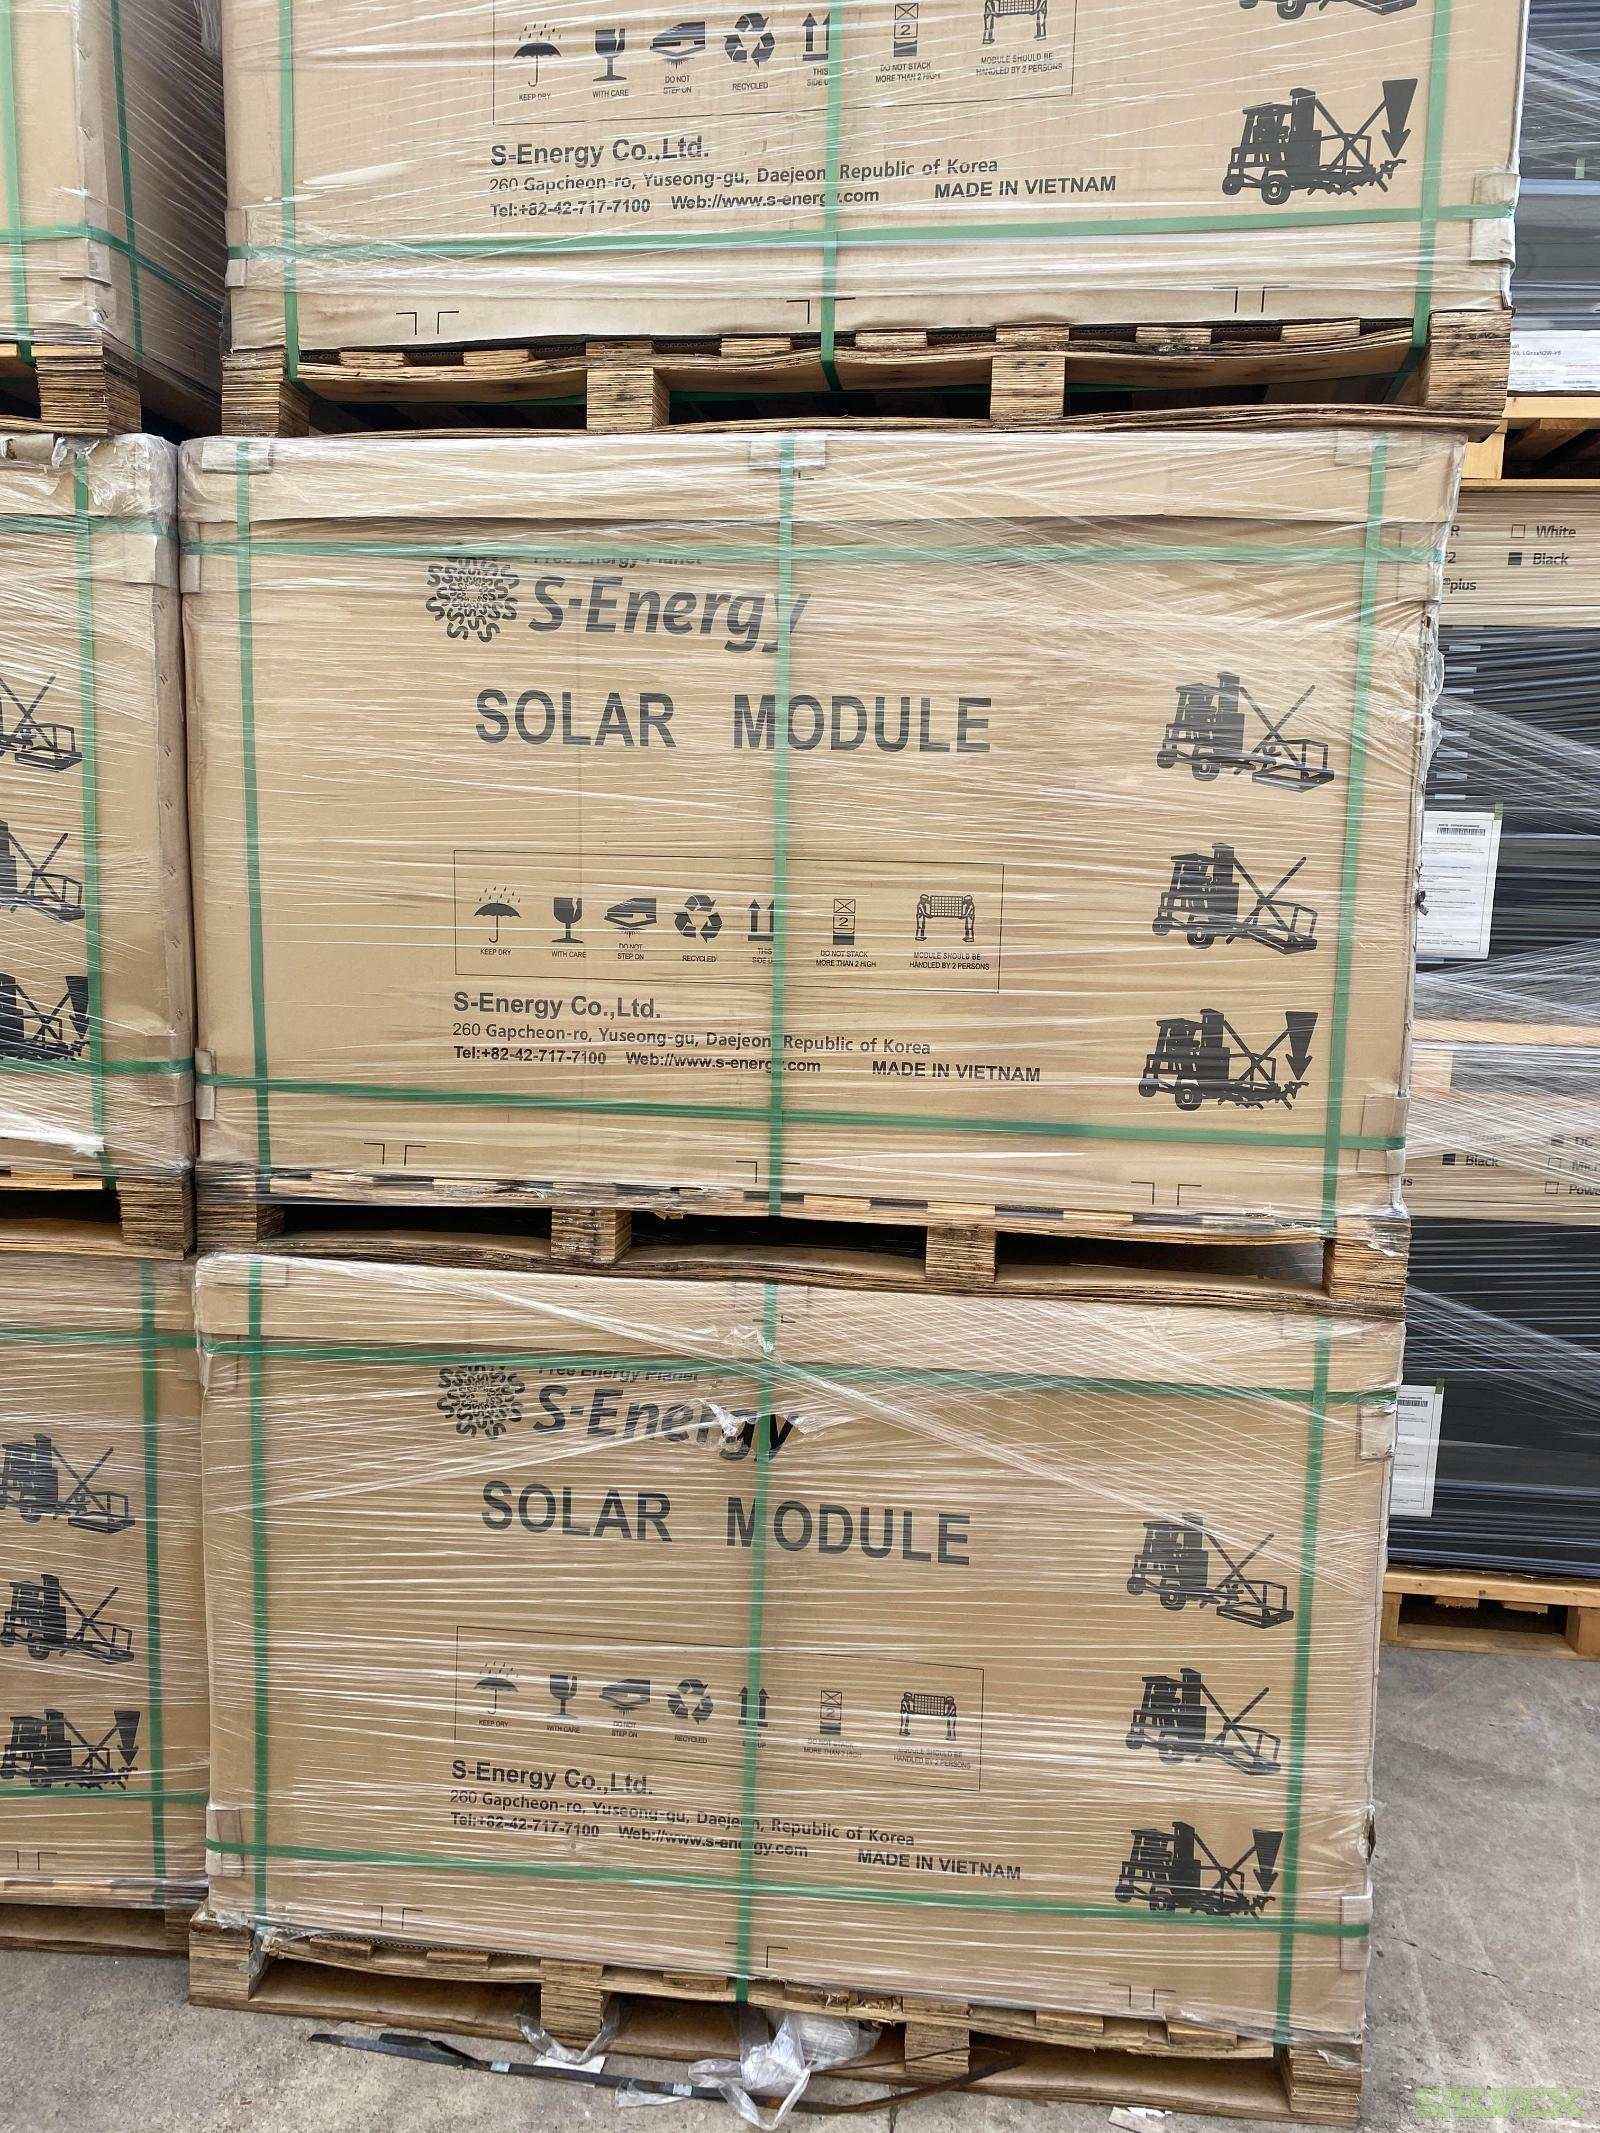 S-Energy 310W Solar Panels - New (265 Units)